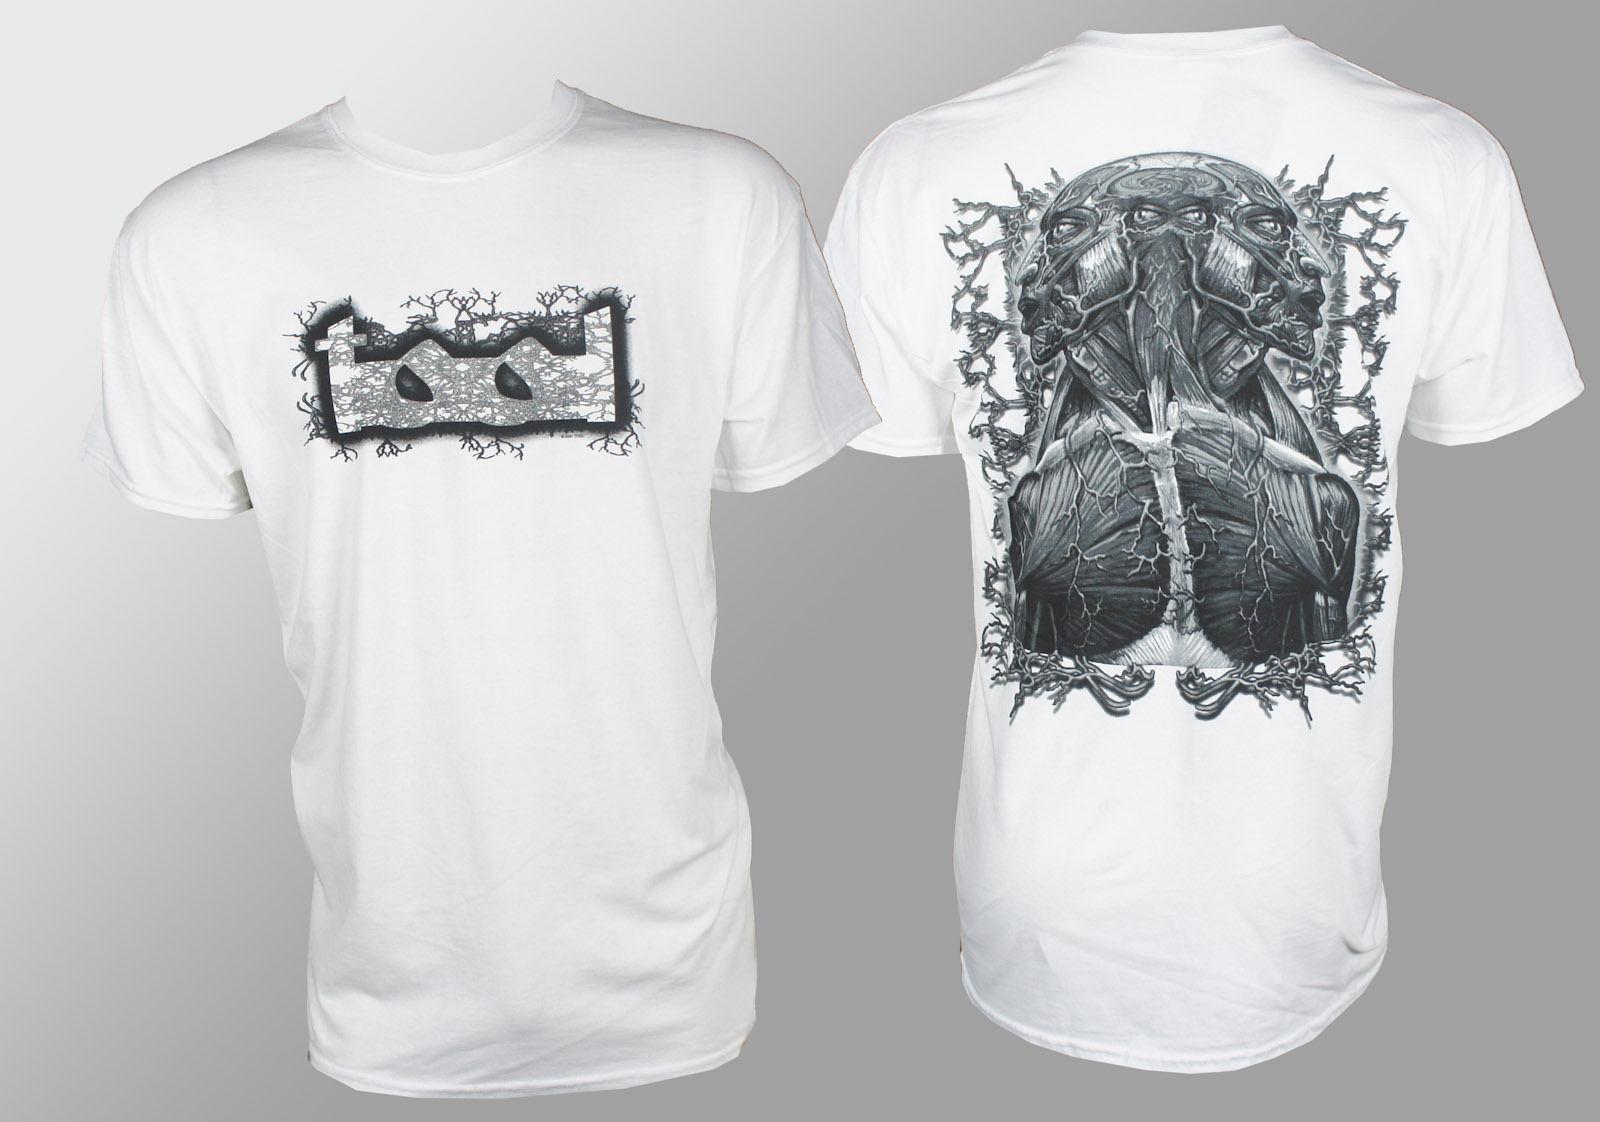 Design t shirt online tool - Gildan Authentic Tool Band Grey Anatomy Man Logo T Shirt S M L Xl Xxl New Men S T Shirt